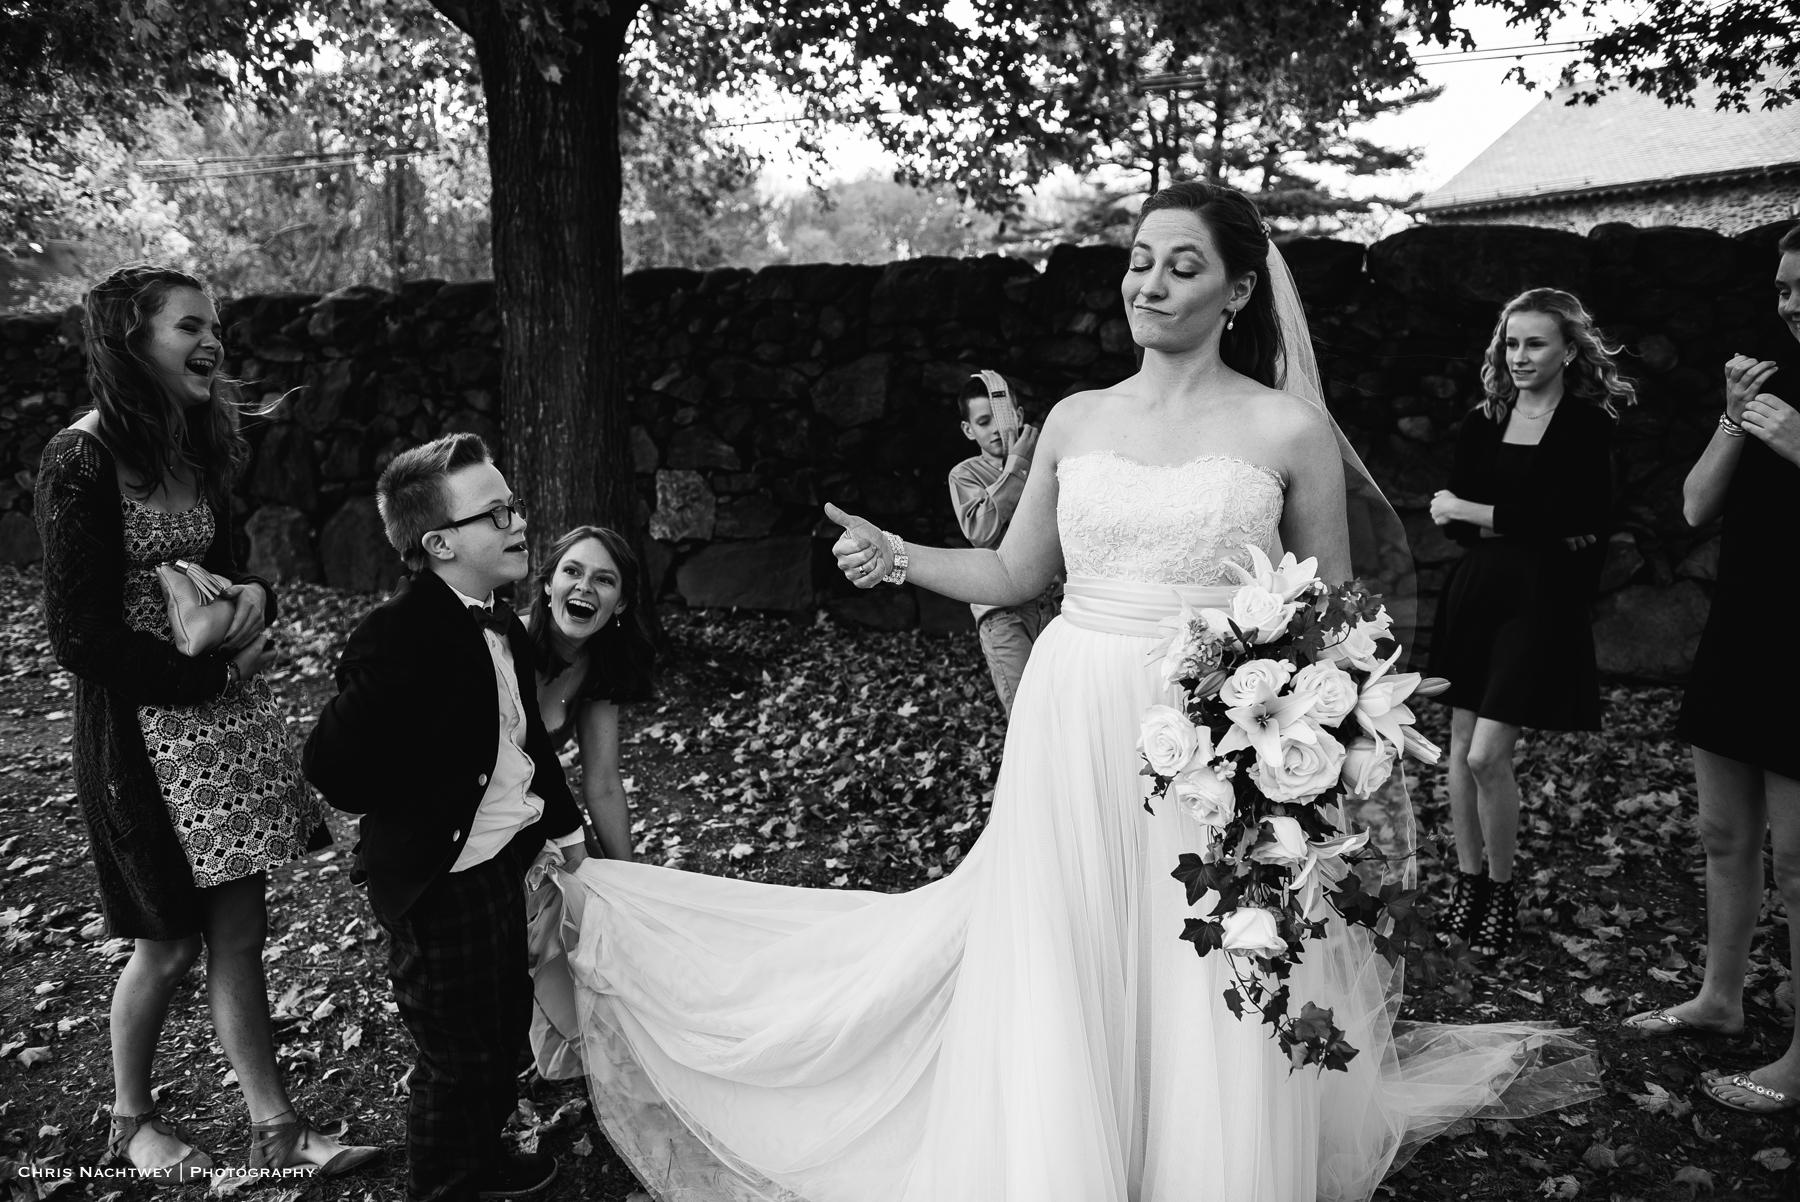 wedding-the-litchfield-inn-ct-photos-chris-nachtwey-photography-2018-36.jpg